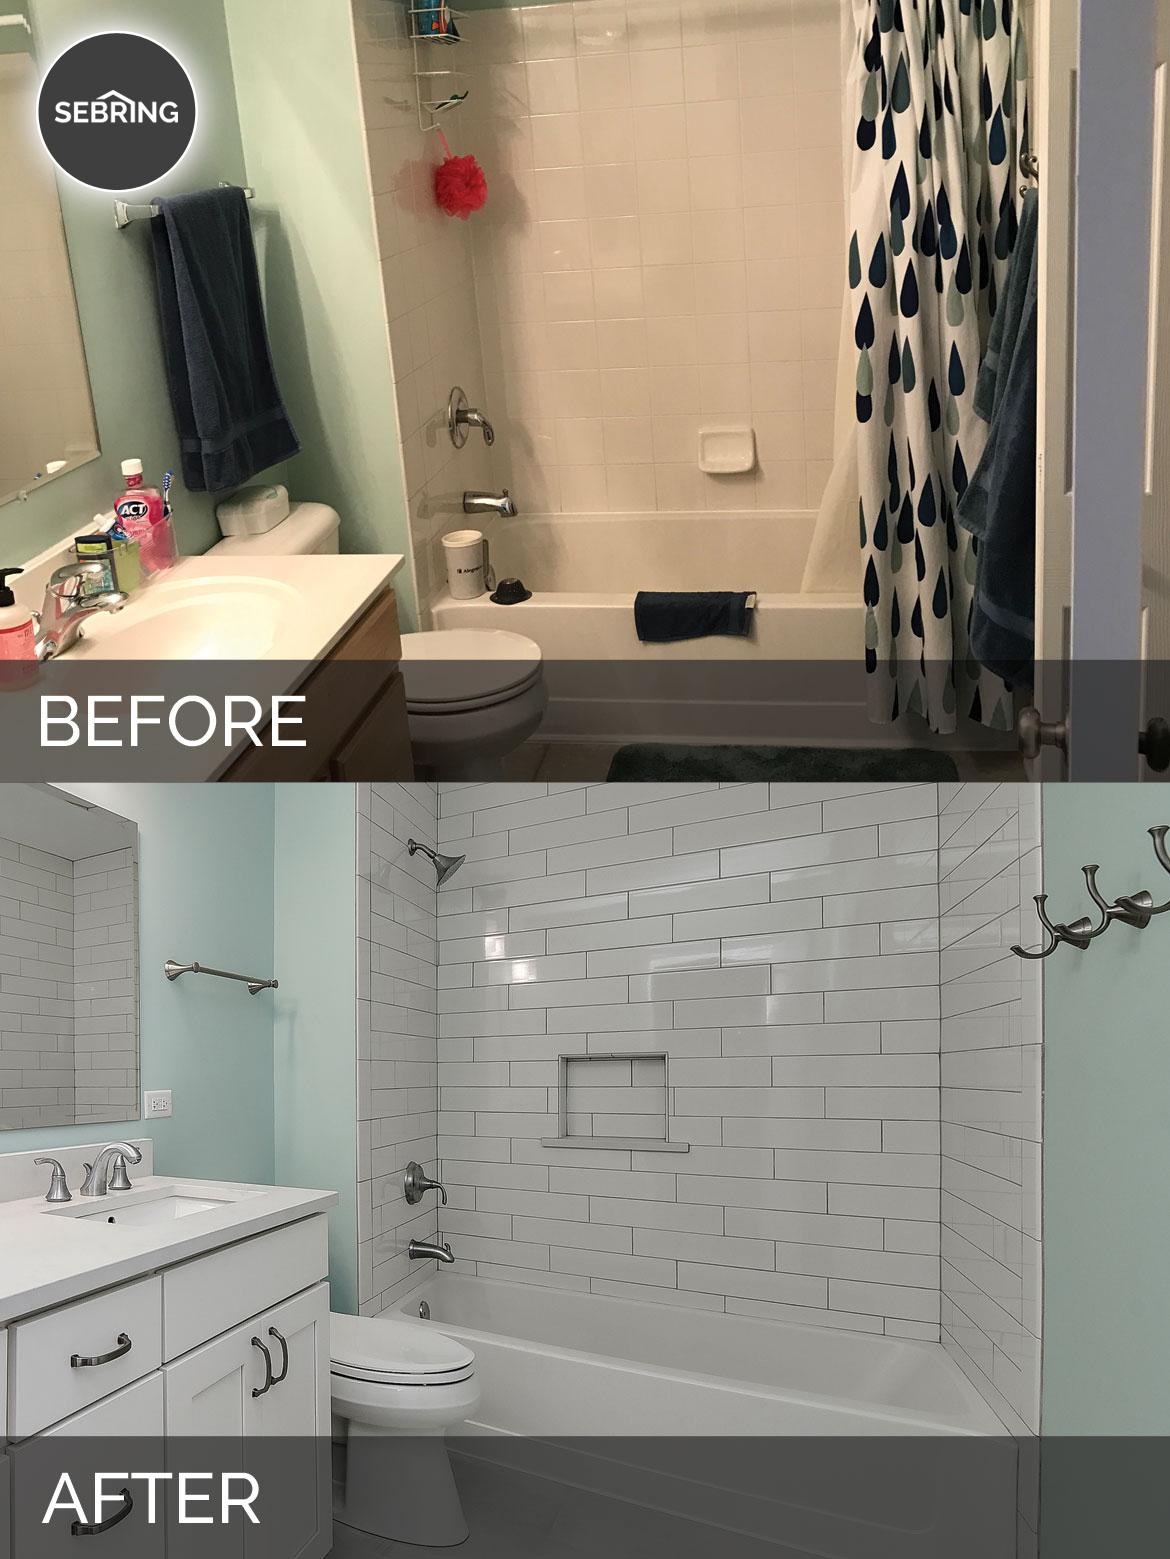 Before & After Guest Hall Bath Plainfield - Sebring Design Build